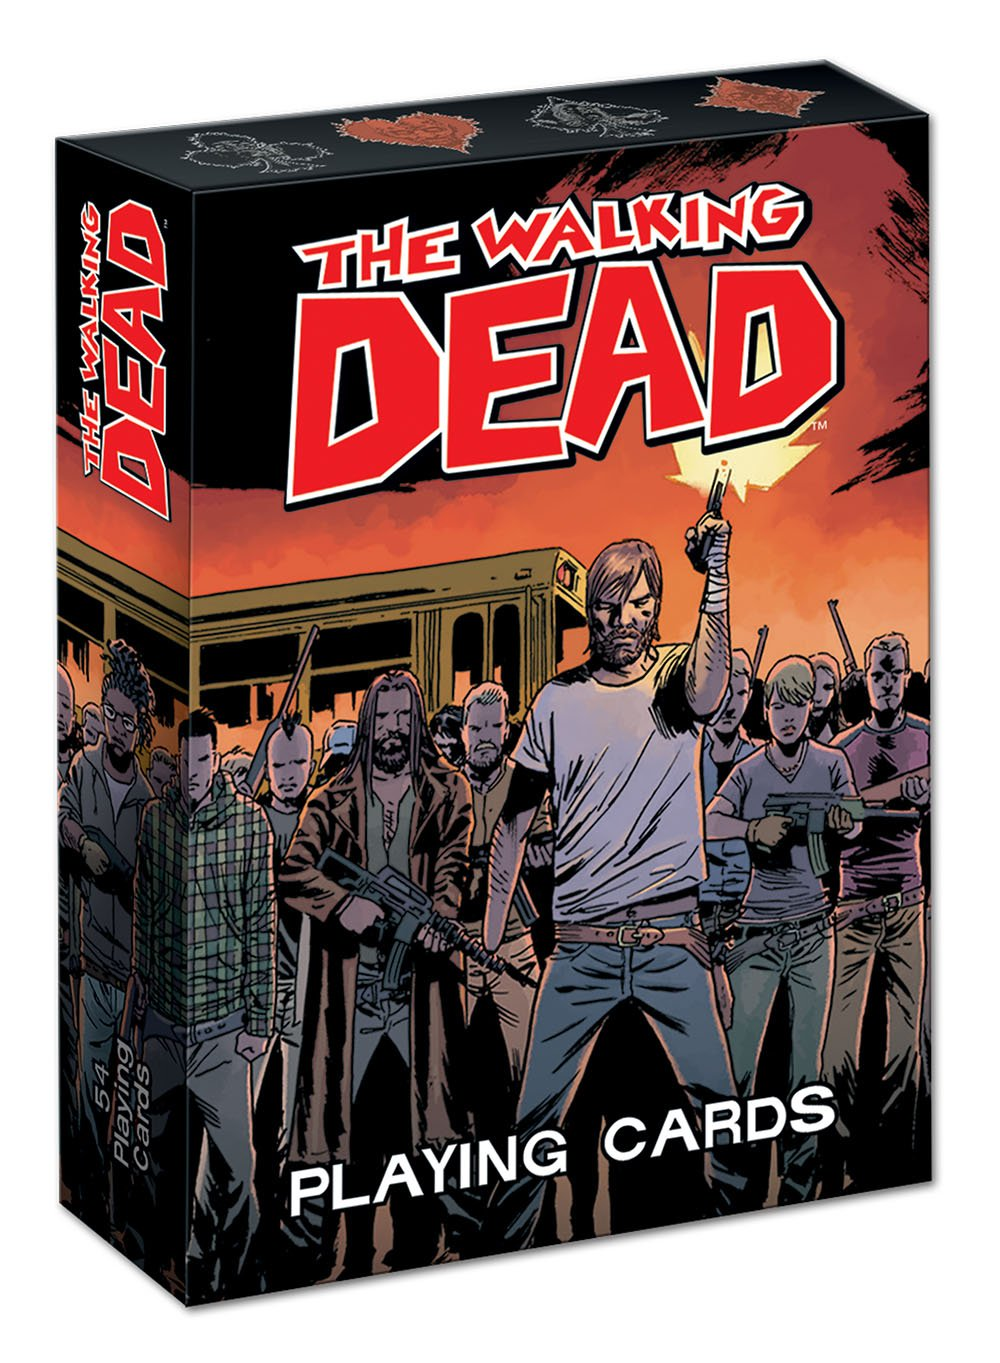 Baraja de cartas The Walking Deadhttps://amzn.to/2QJizem